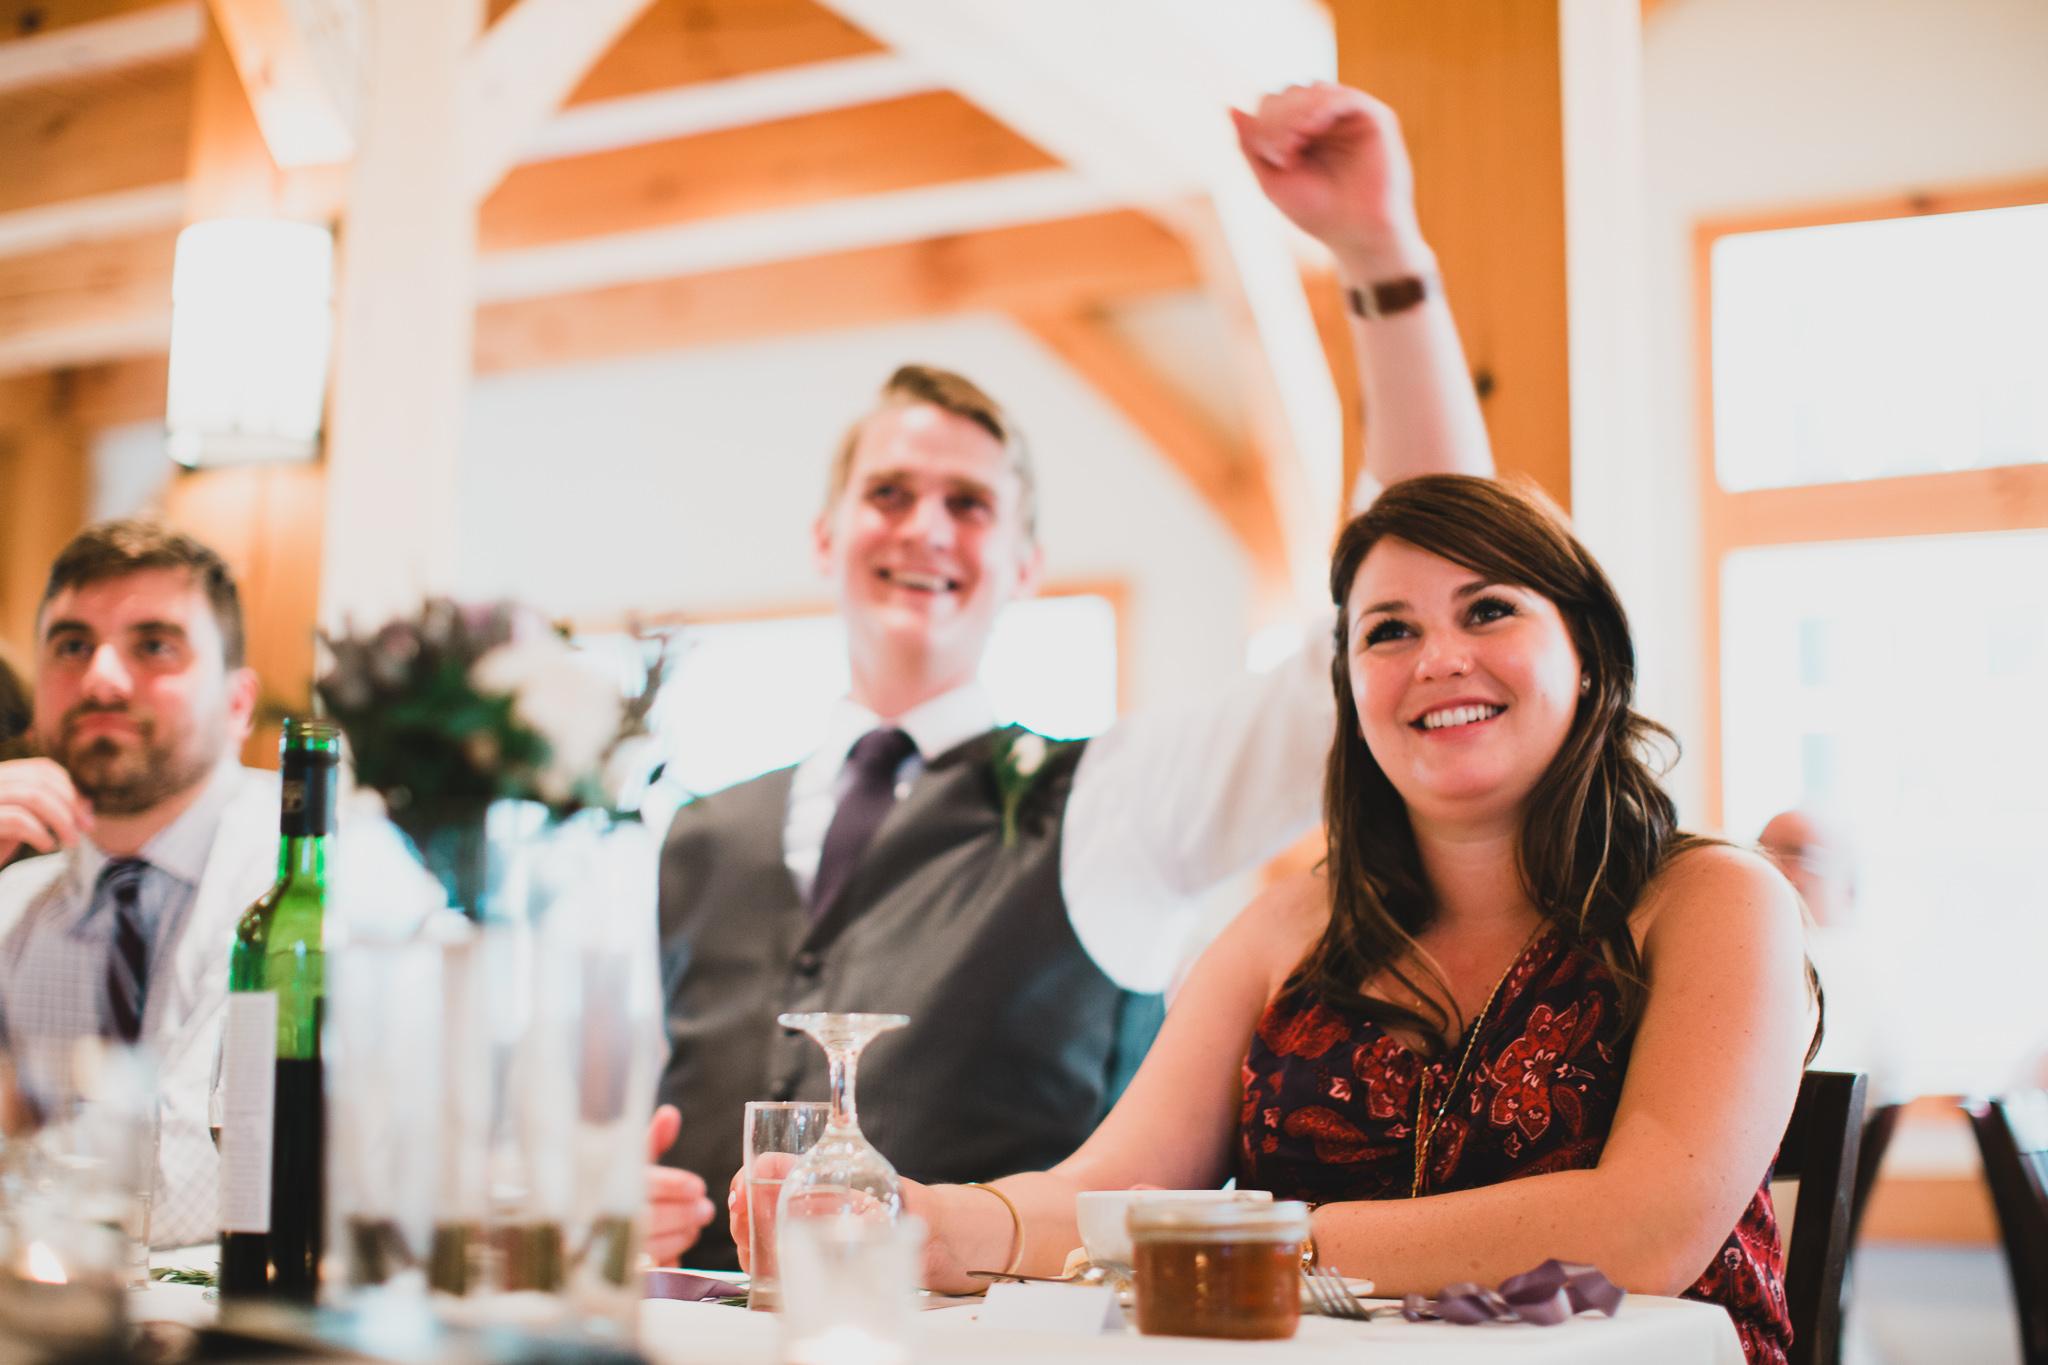 Natural and candid wedding photos